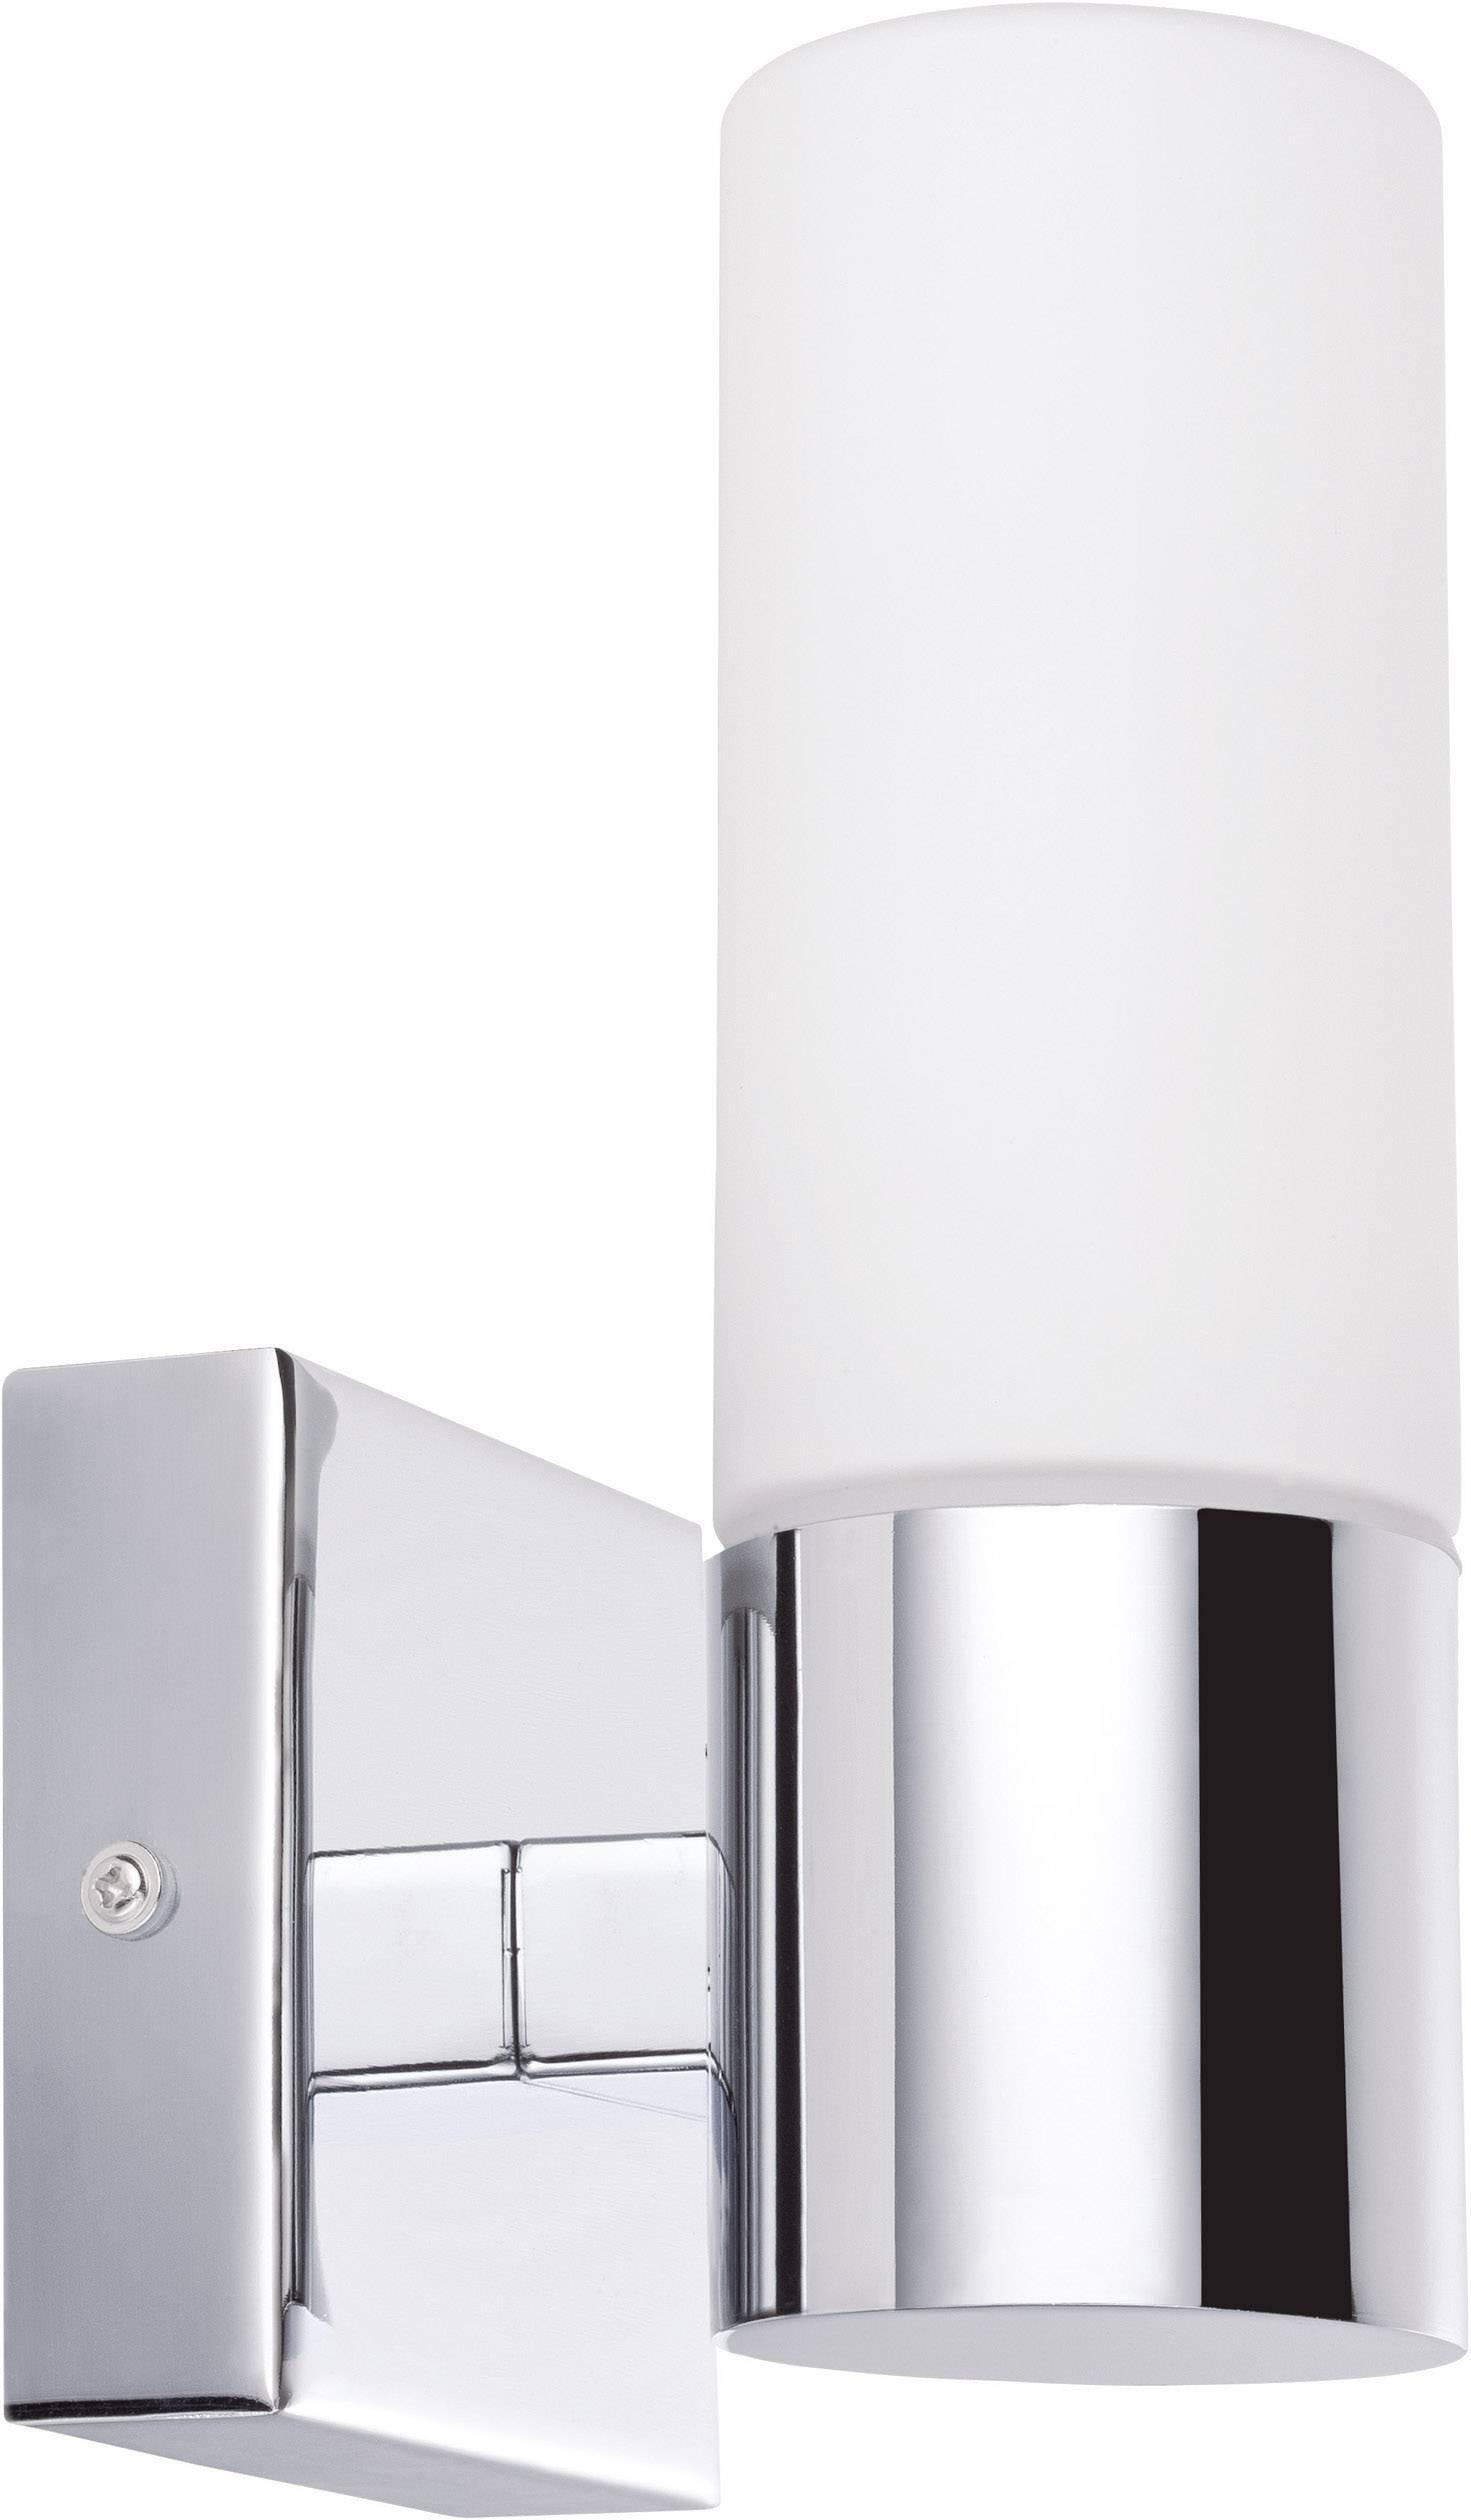 Badkamer wandlamp Halogeen, Spaarlamp E14 40 W Paulmann Gemini 70354 ...